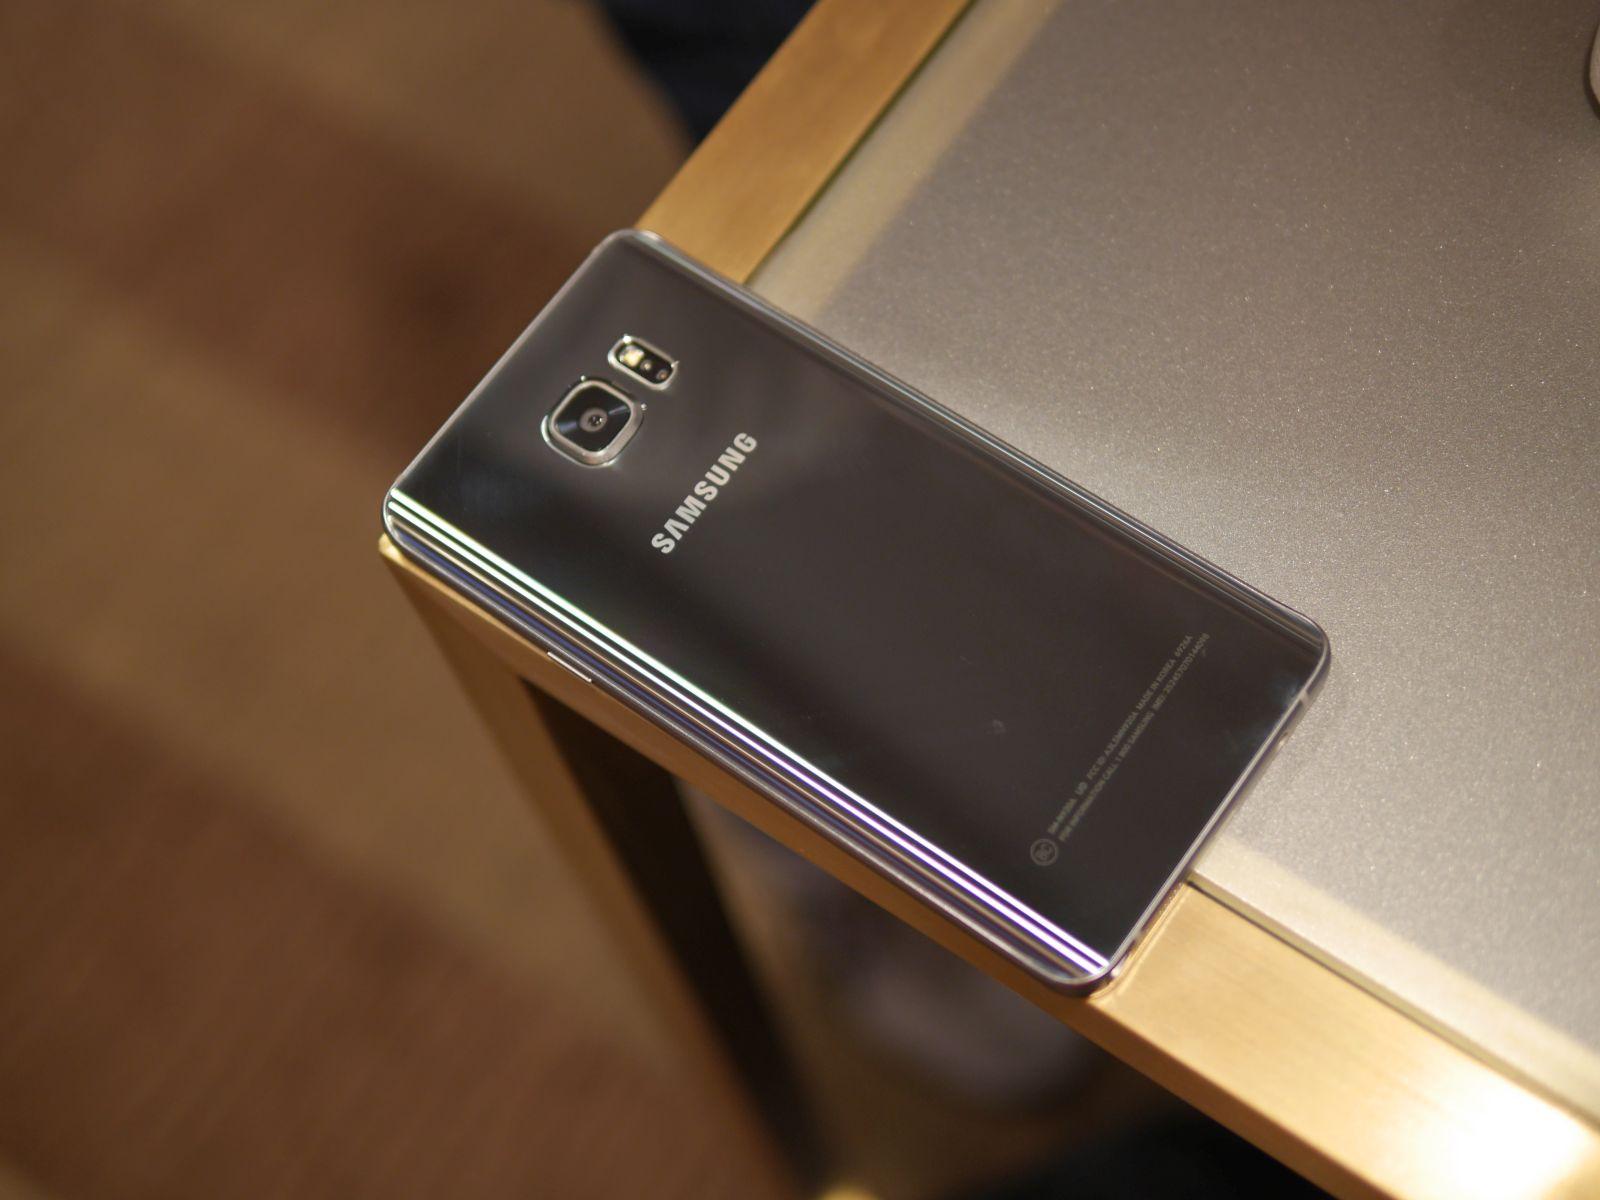 Samsung Galaxy S6 edge Plus 18